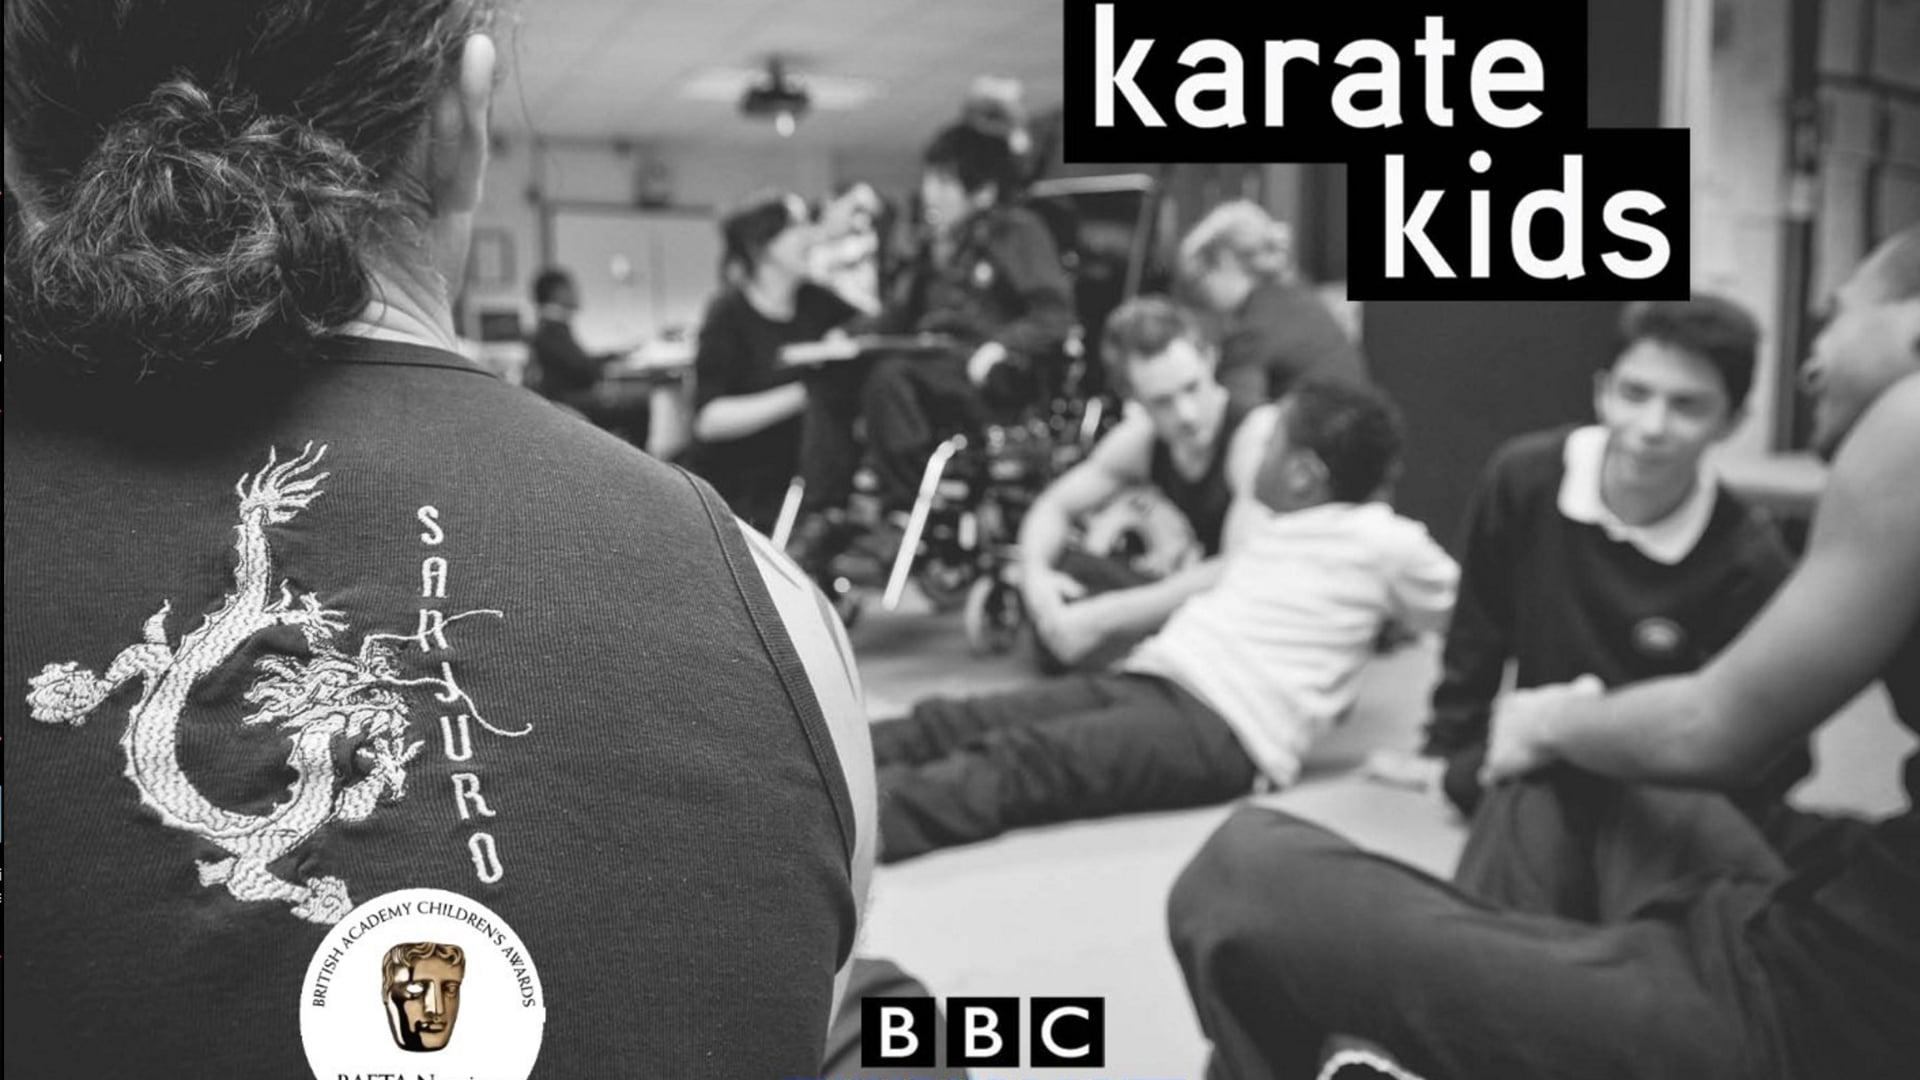 My Life Katate Kids [BBC]